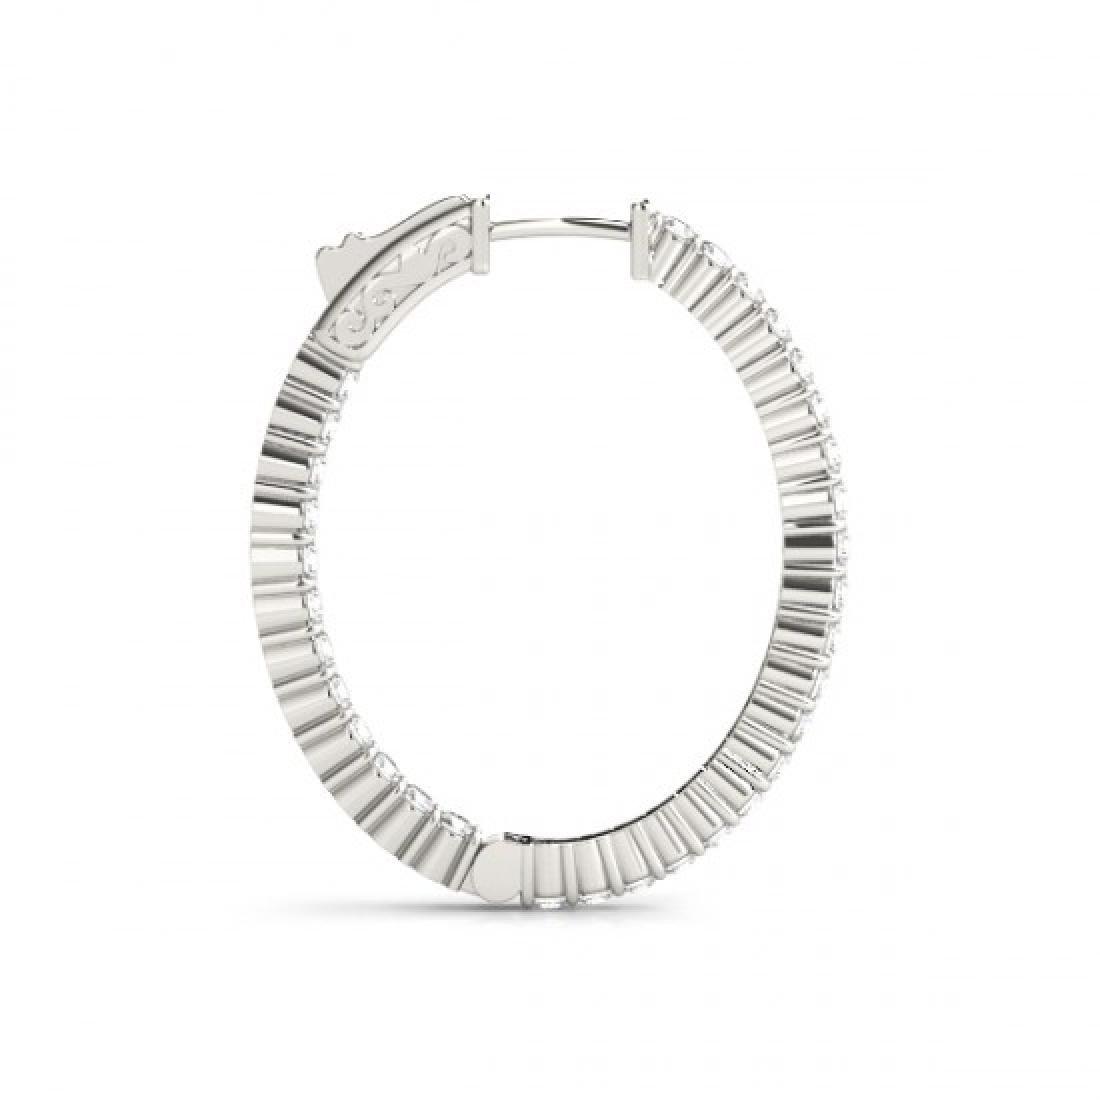 4.5 CTW Diamond VS/SI Certified 23 Mm Hoop Earrings 14K - 3